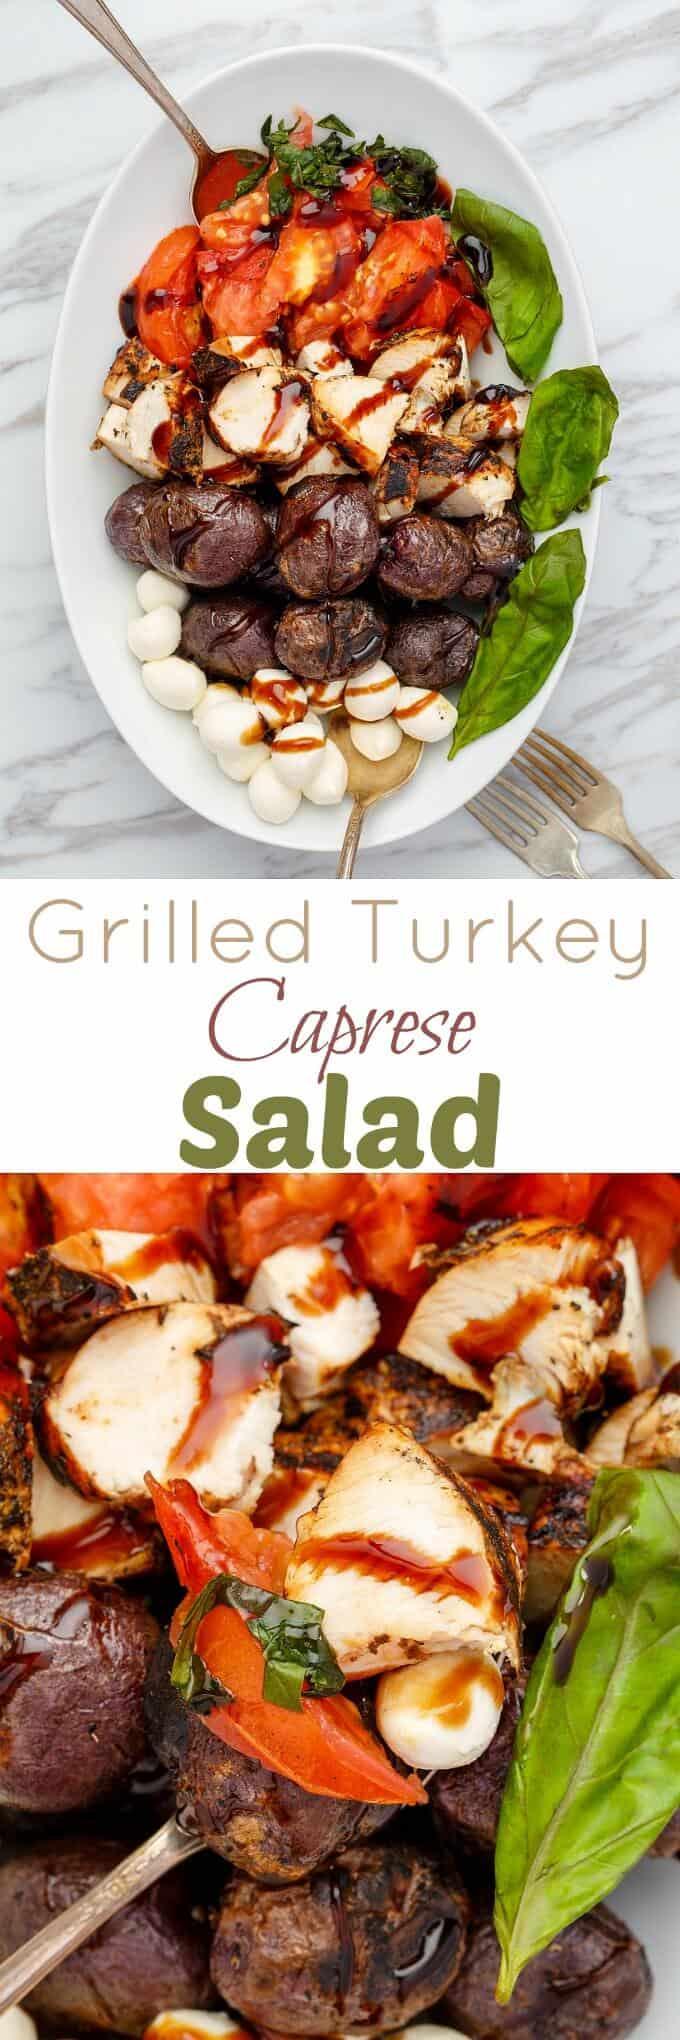 Grilled Turkey Caprese Salad